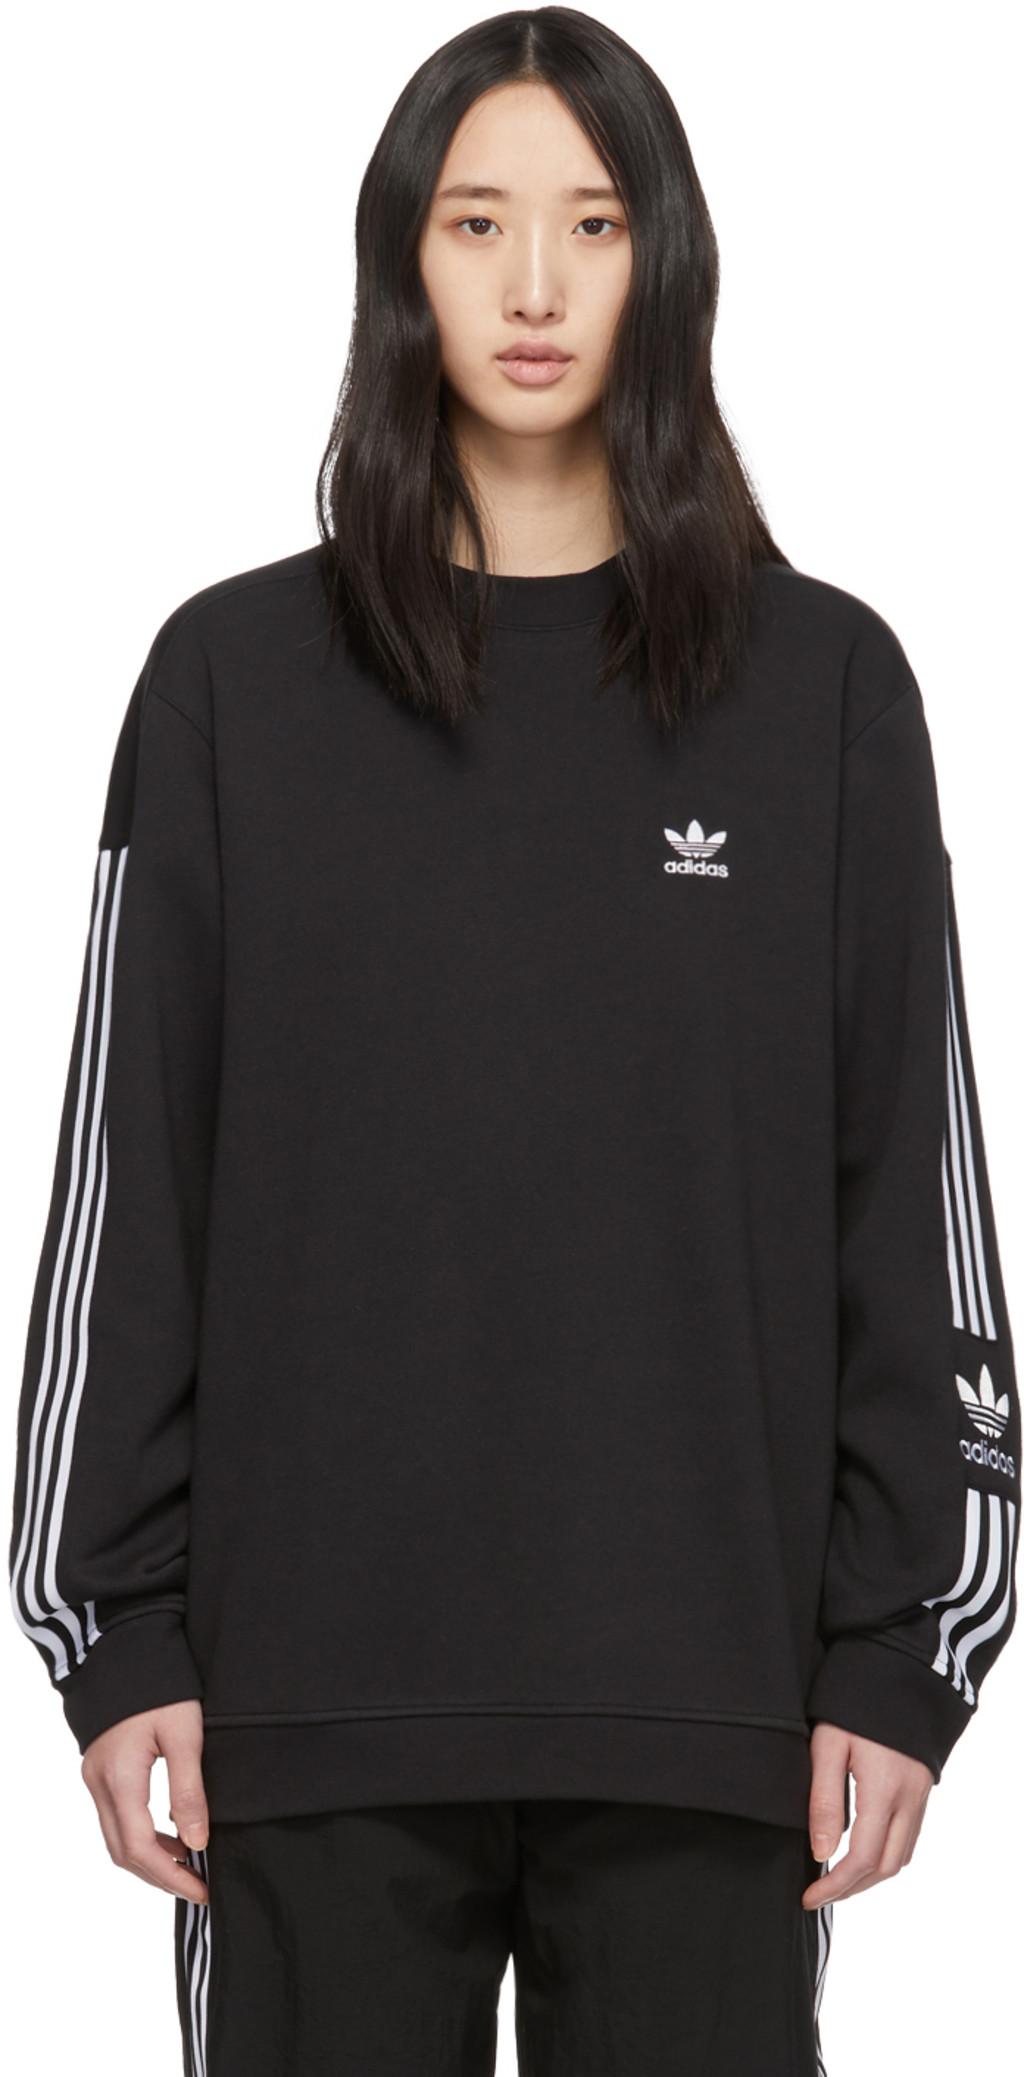 b00e950337 Black Lock Up Sweatshirt